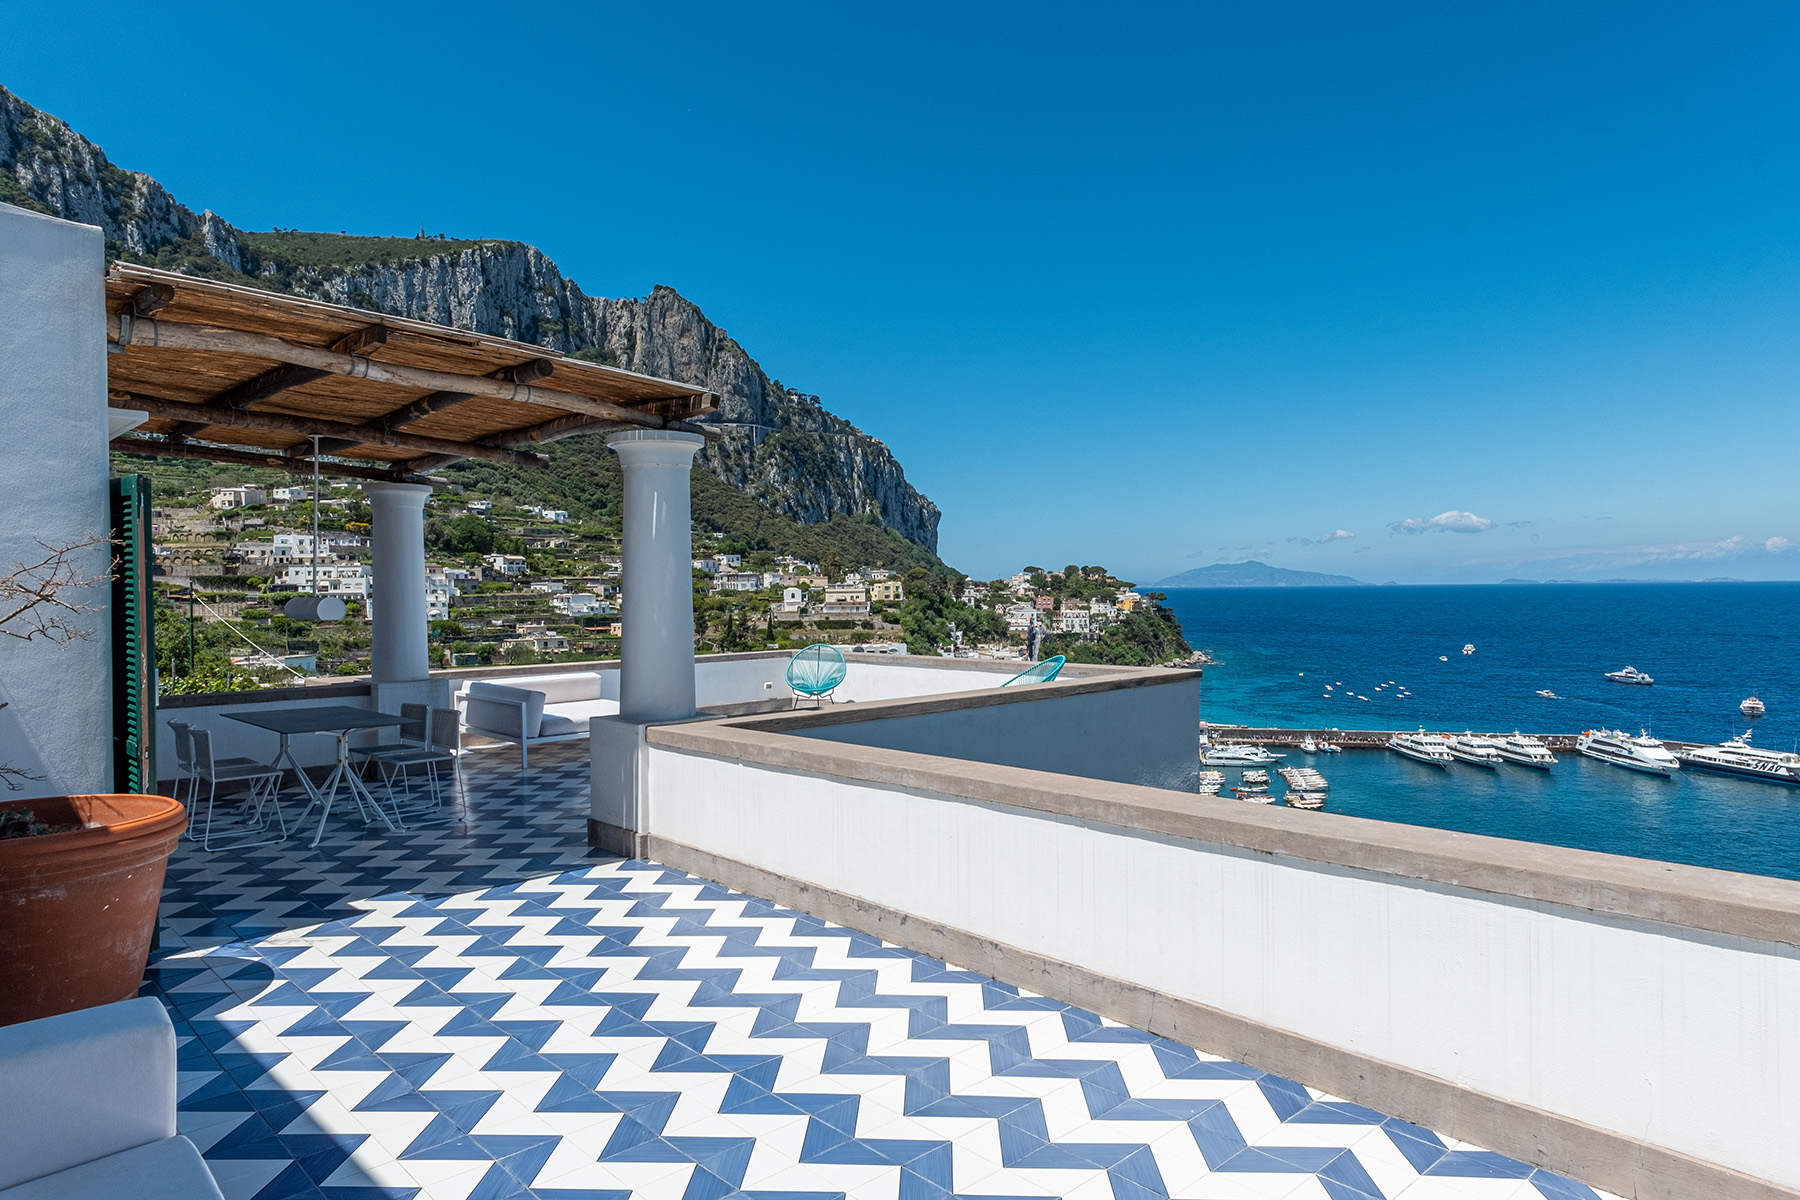 Casa indipendente in Vendita a Capri: 5 locali, 150 mq